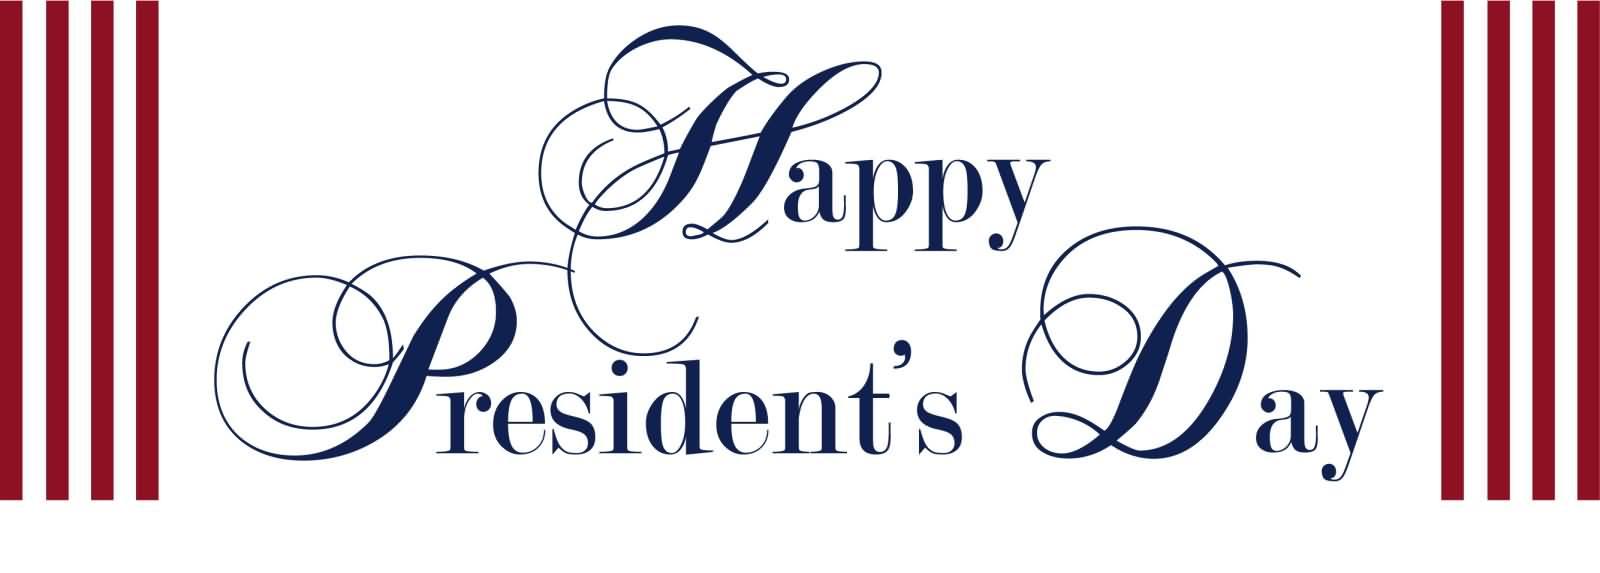 2017 Presidents Day Wallpaper